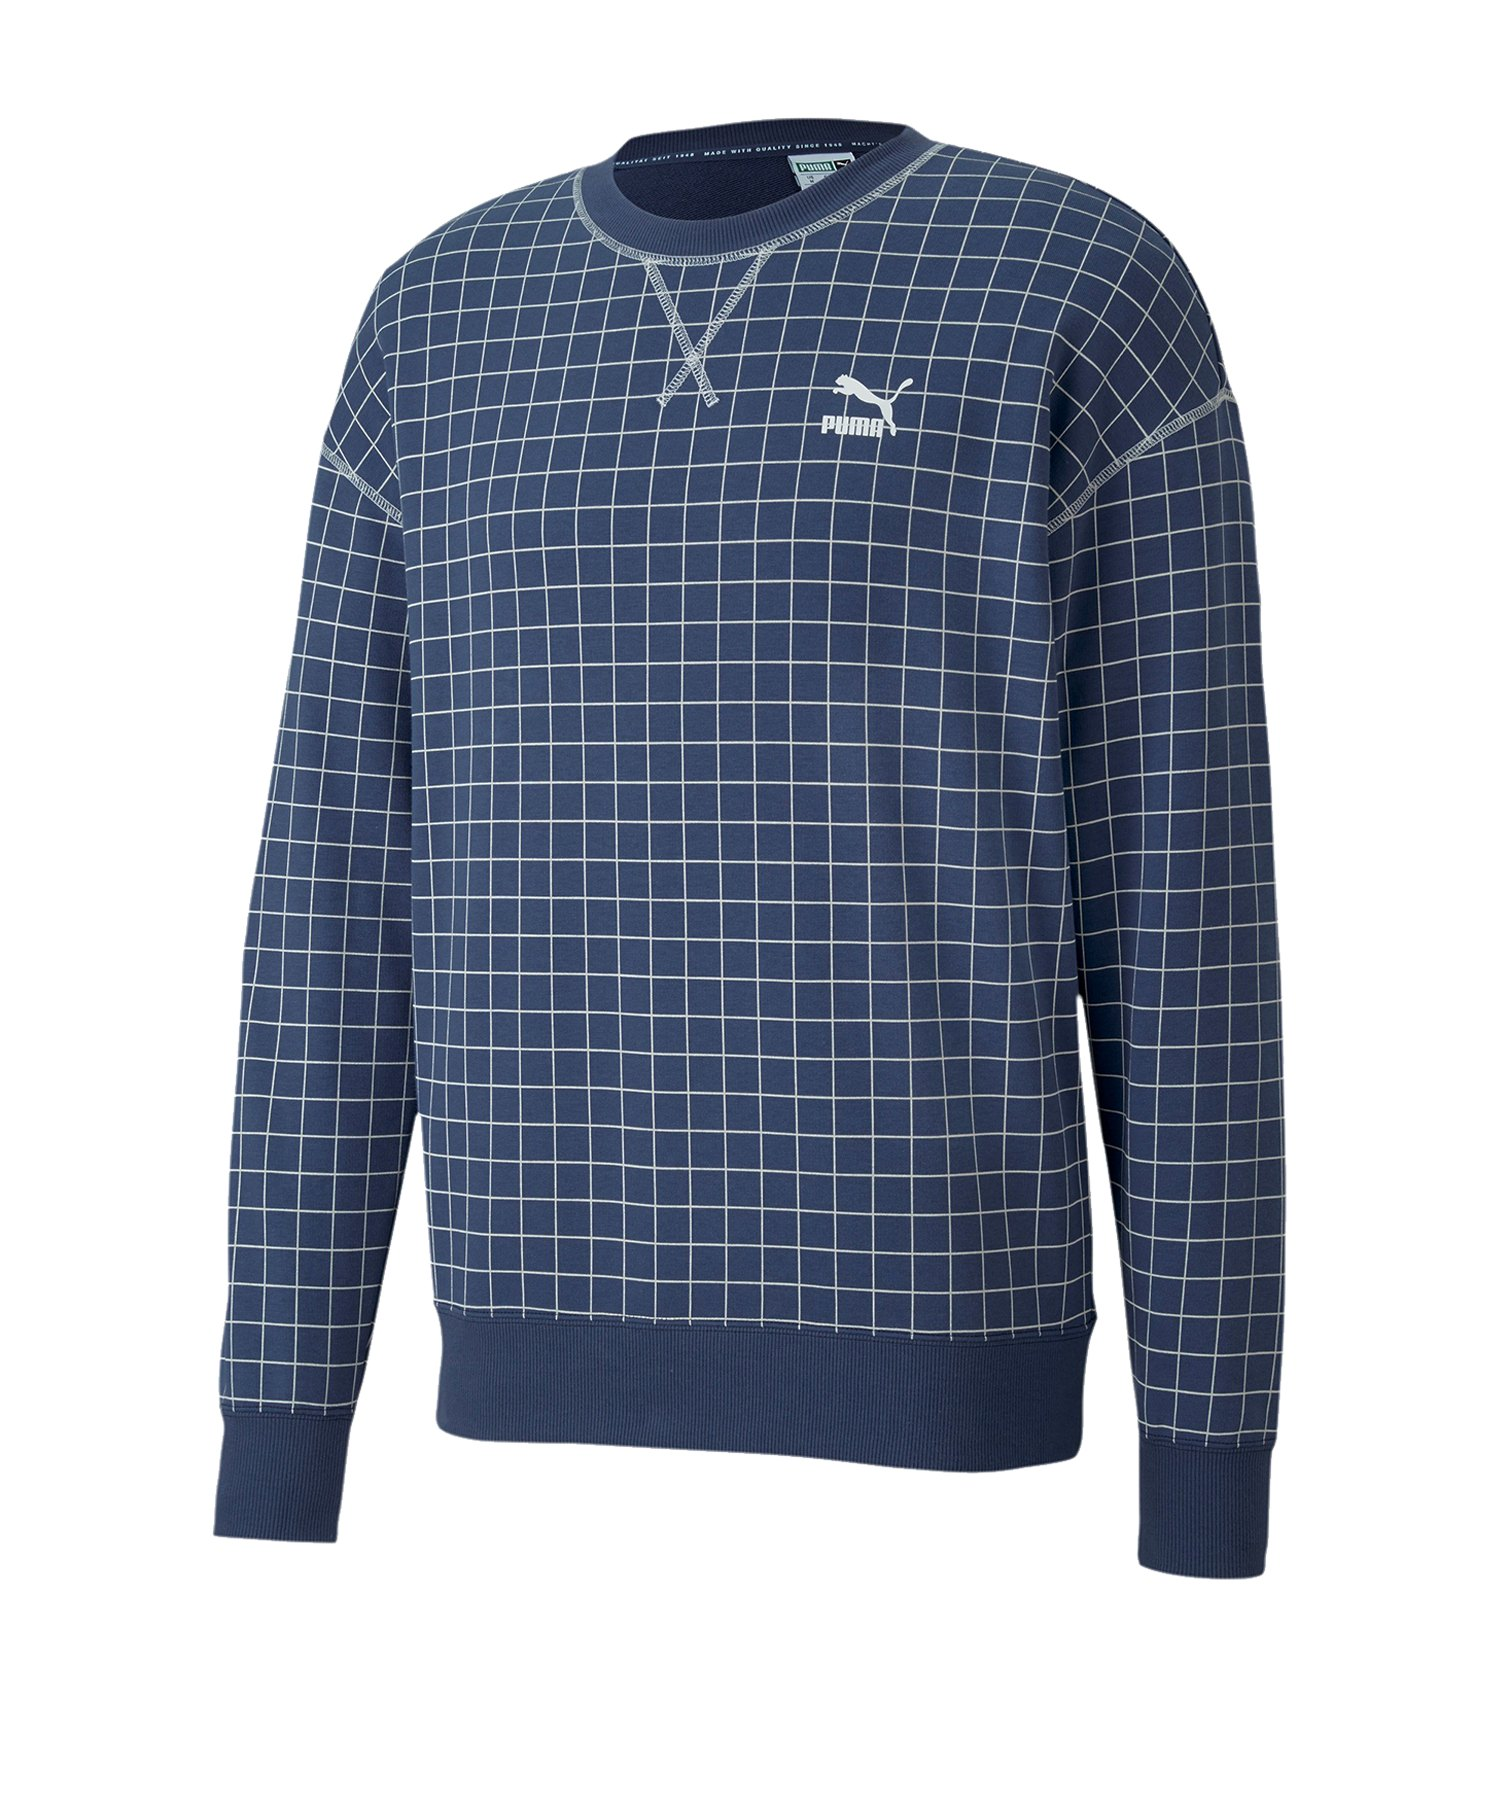 PUMA Recheck Pack Crew Sweatshirt Blau F43 - blau